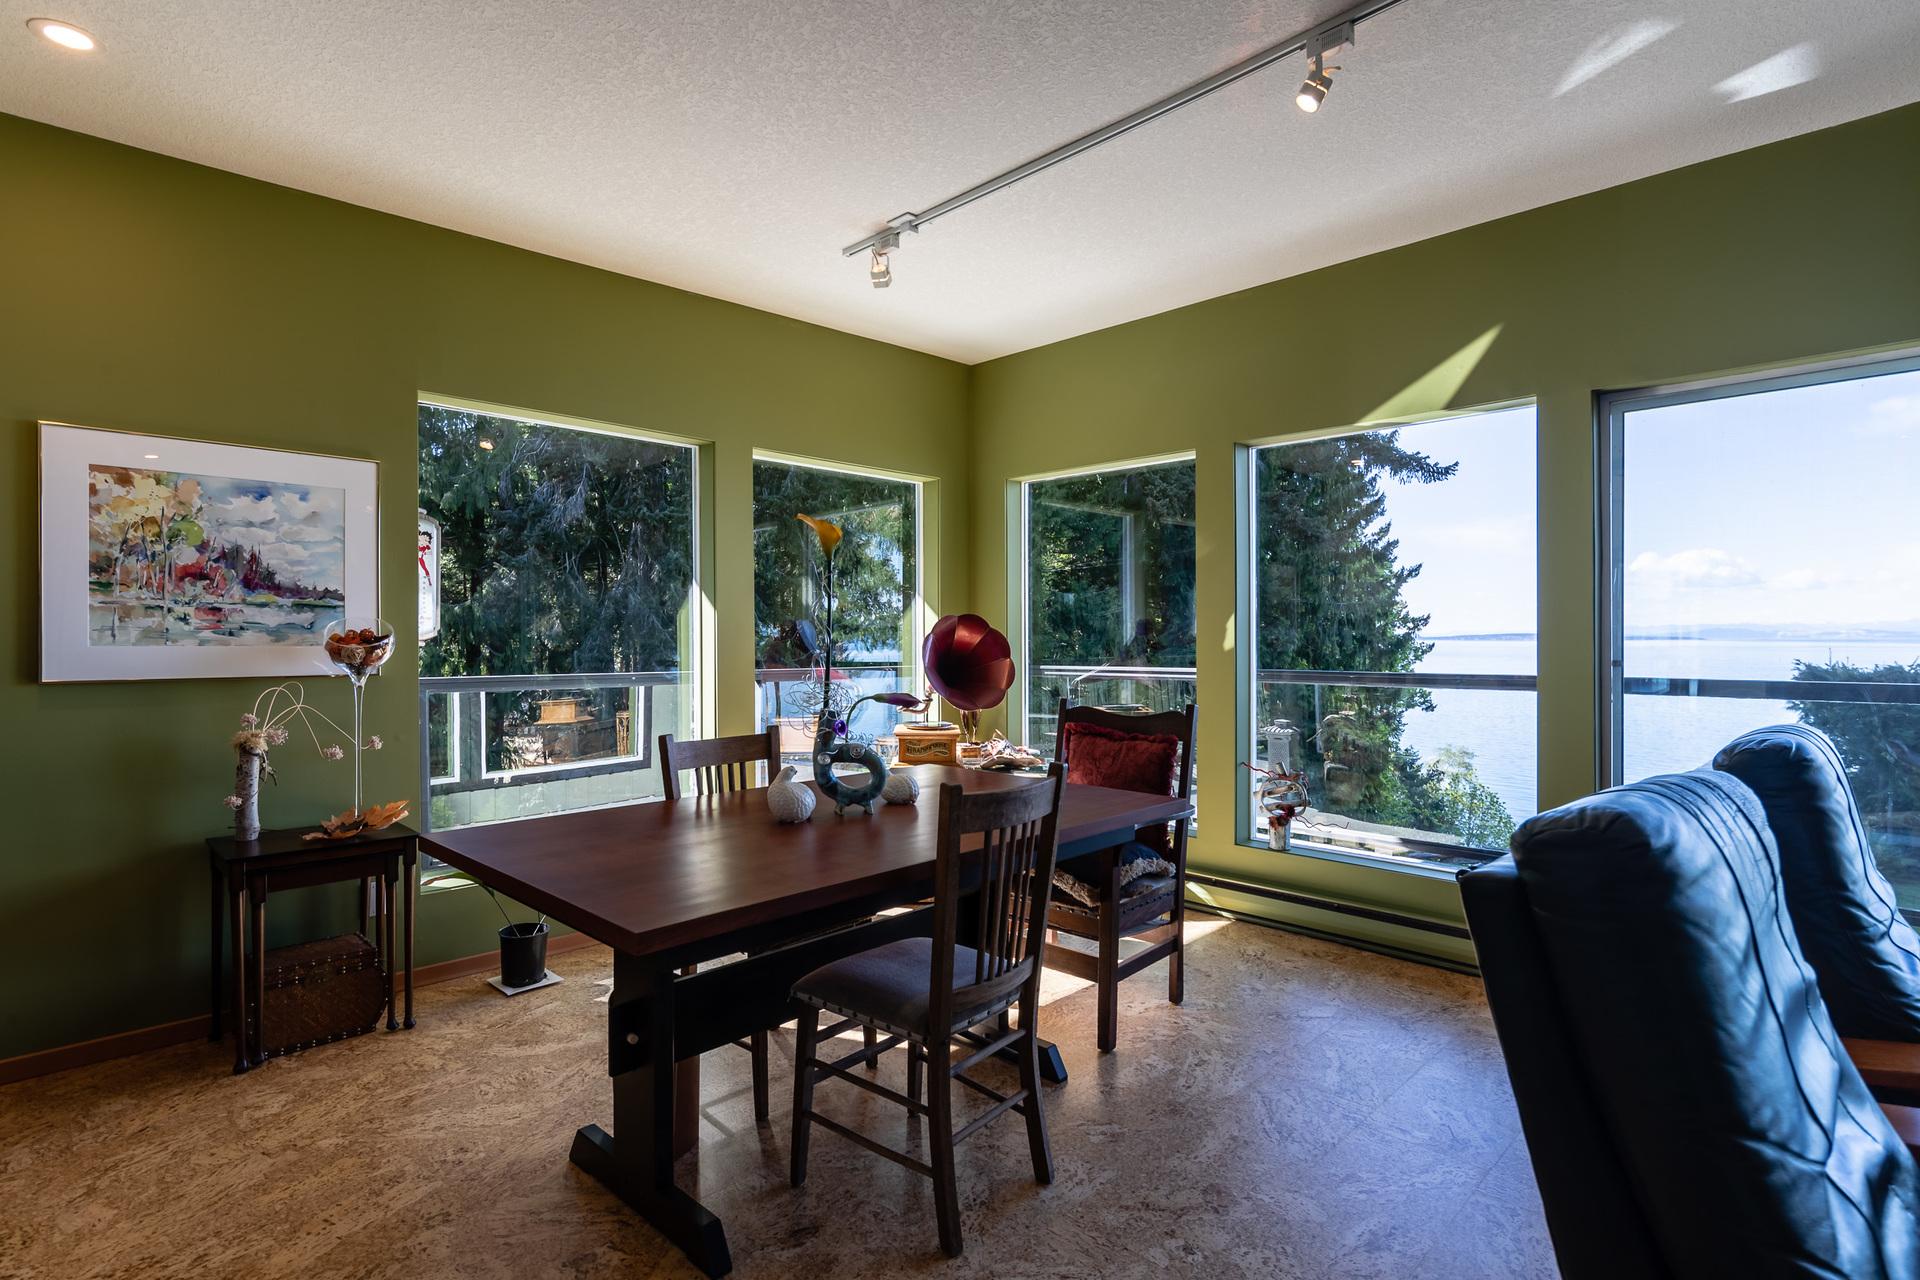 First Master Suite Dining Area at 5101 Island Highway West, Qualicum Beach, Zone 05 - Parksville/Qualicum